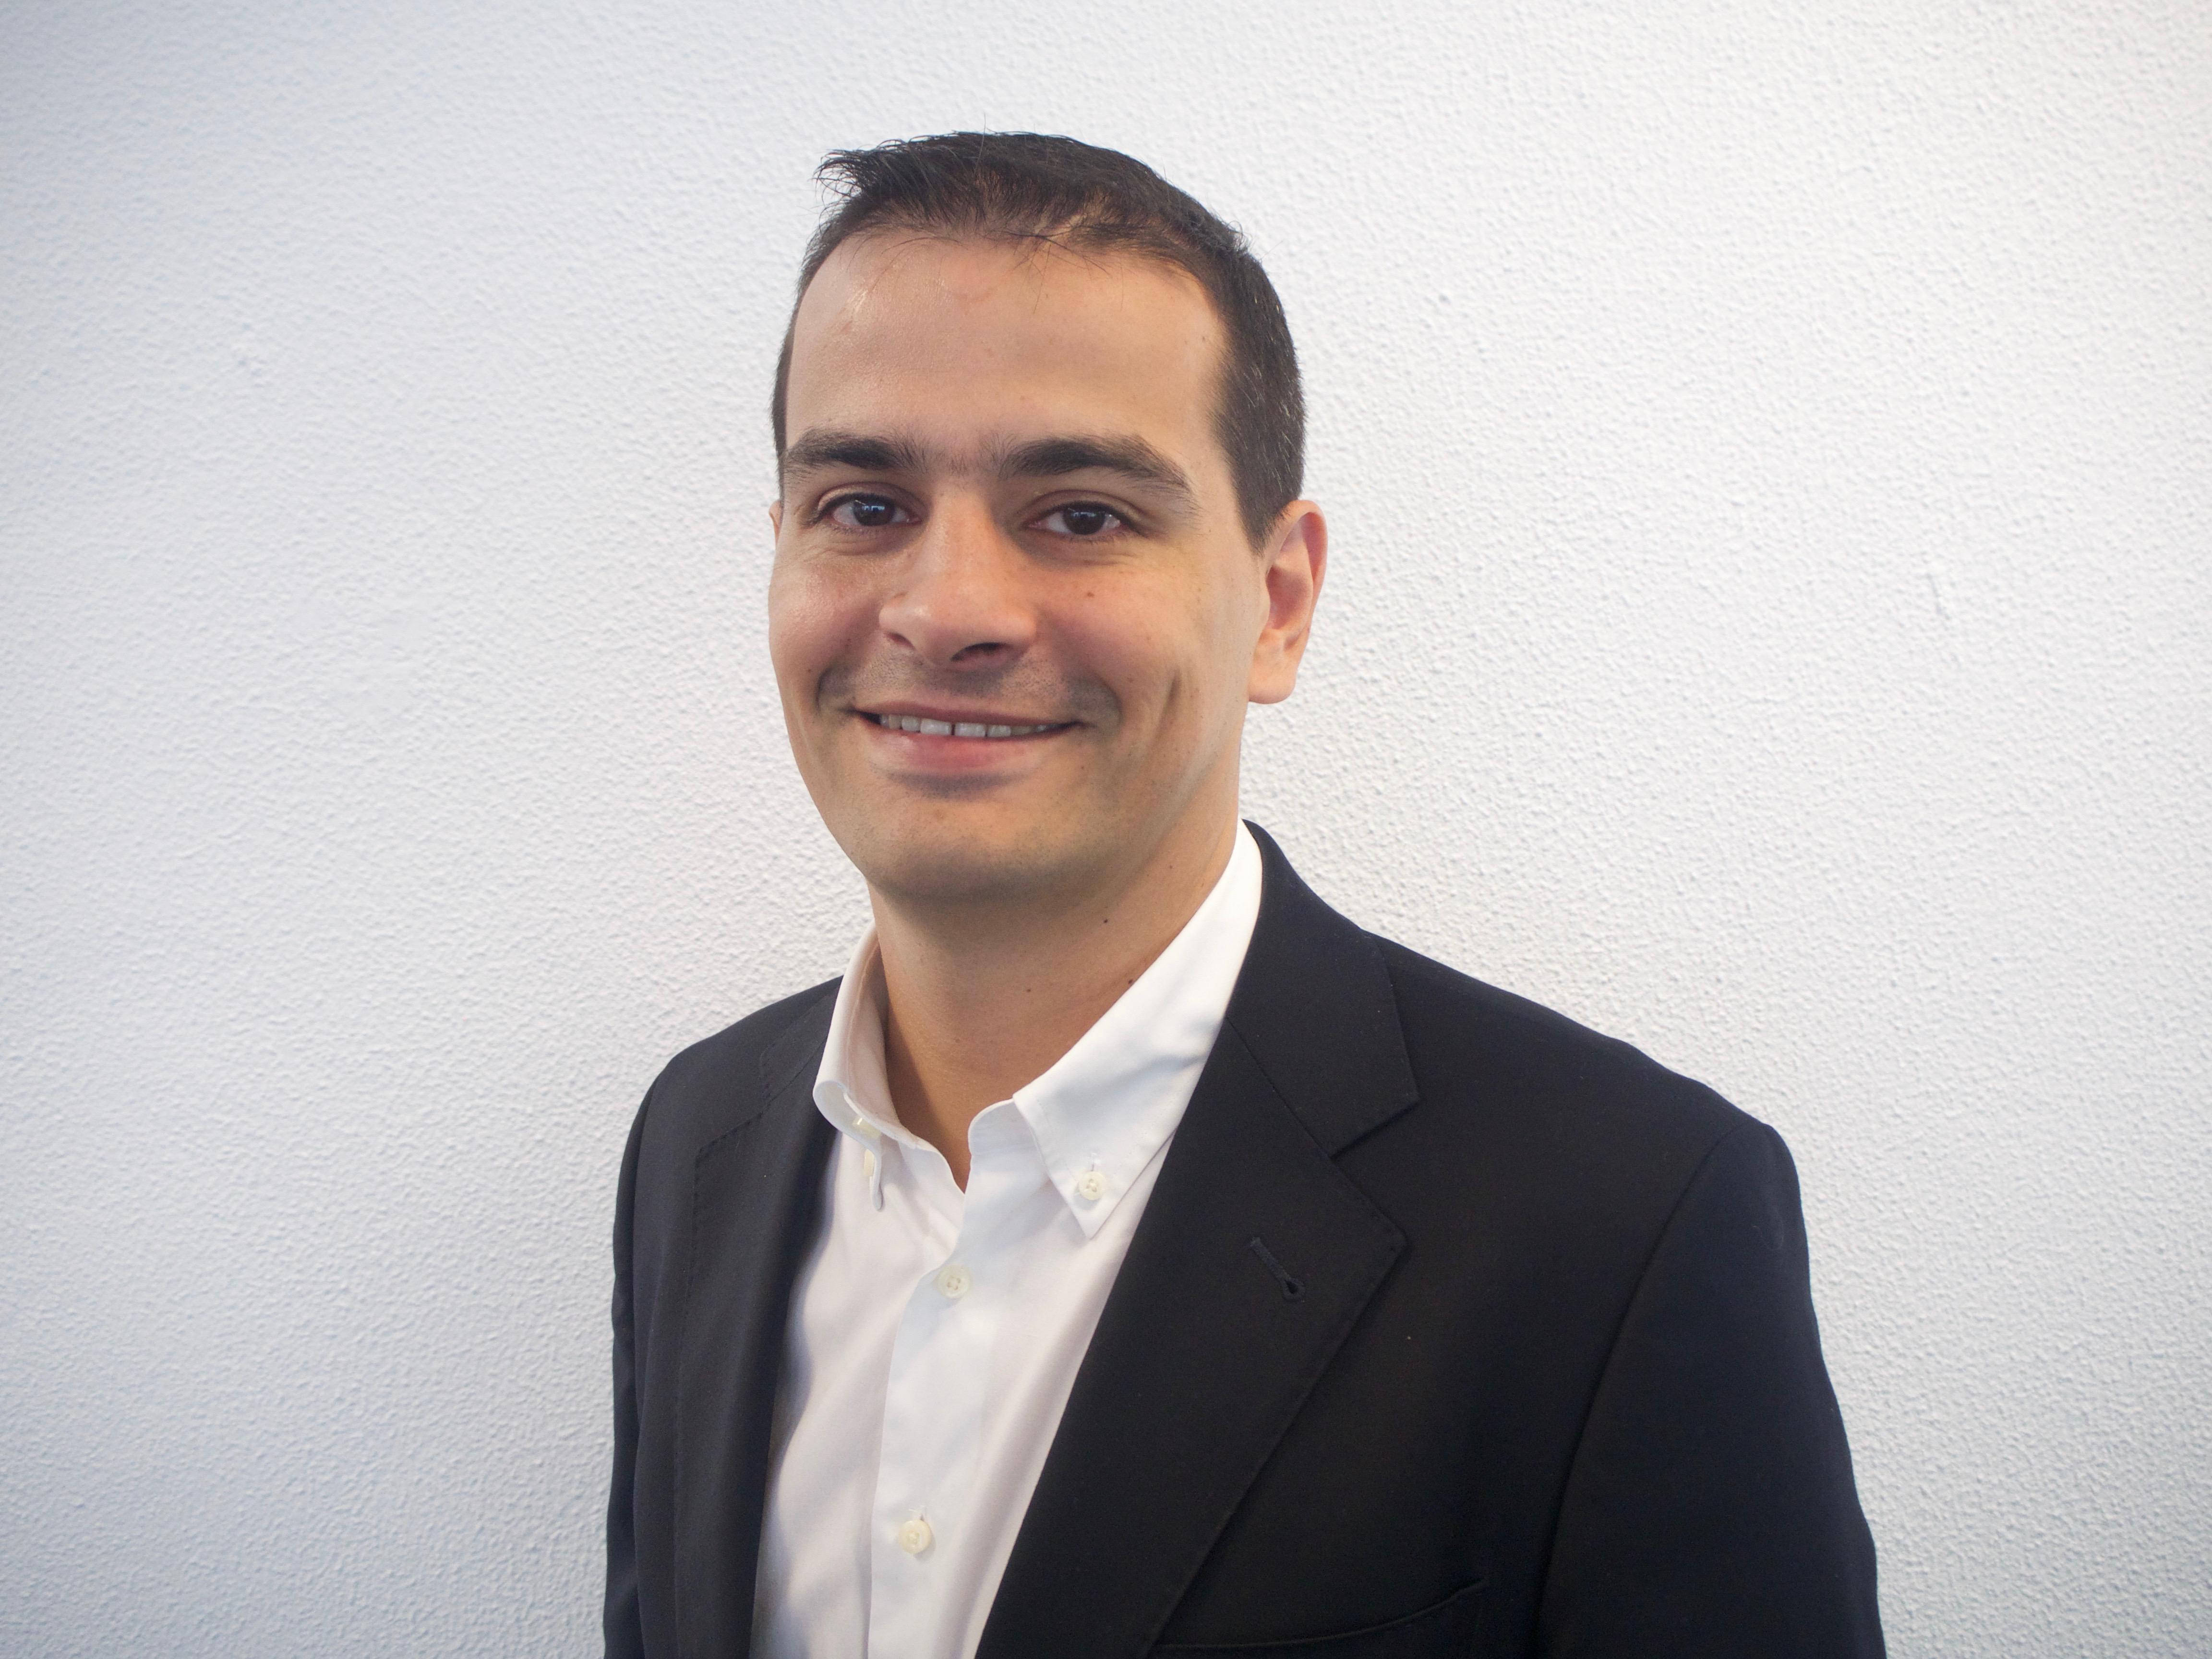 Luis Gonçalves, Noesis